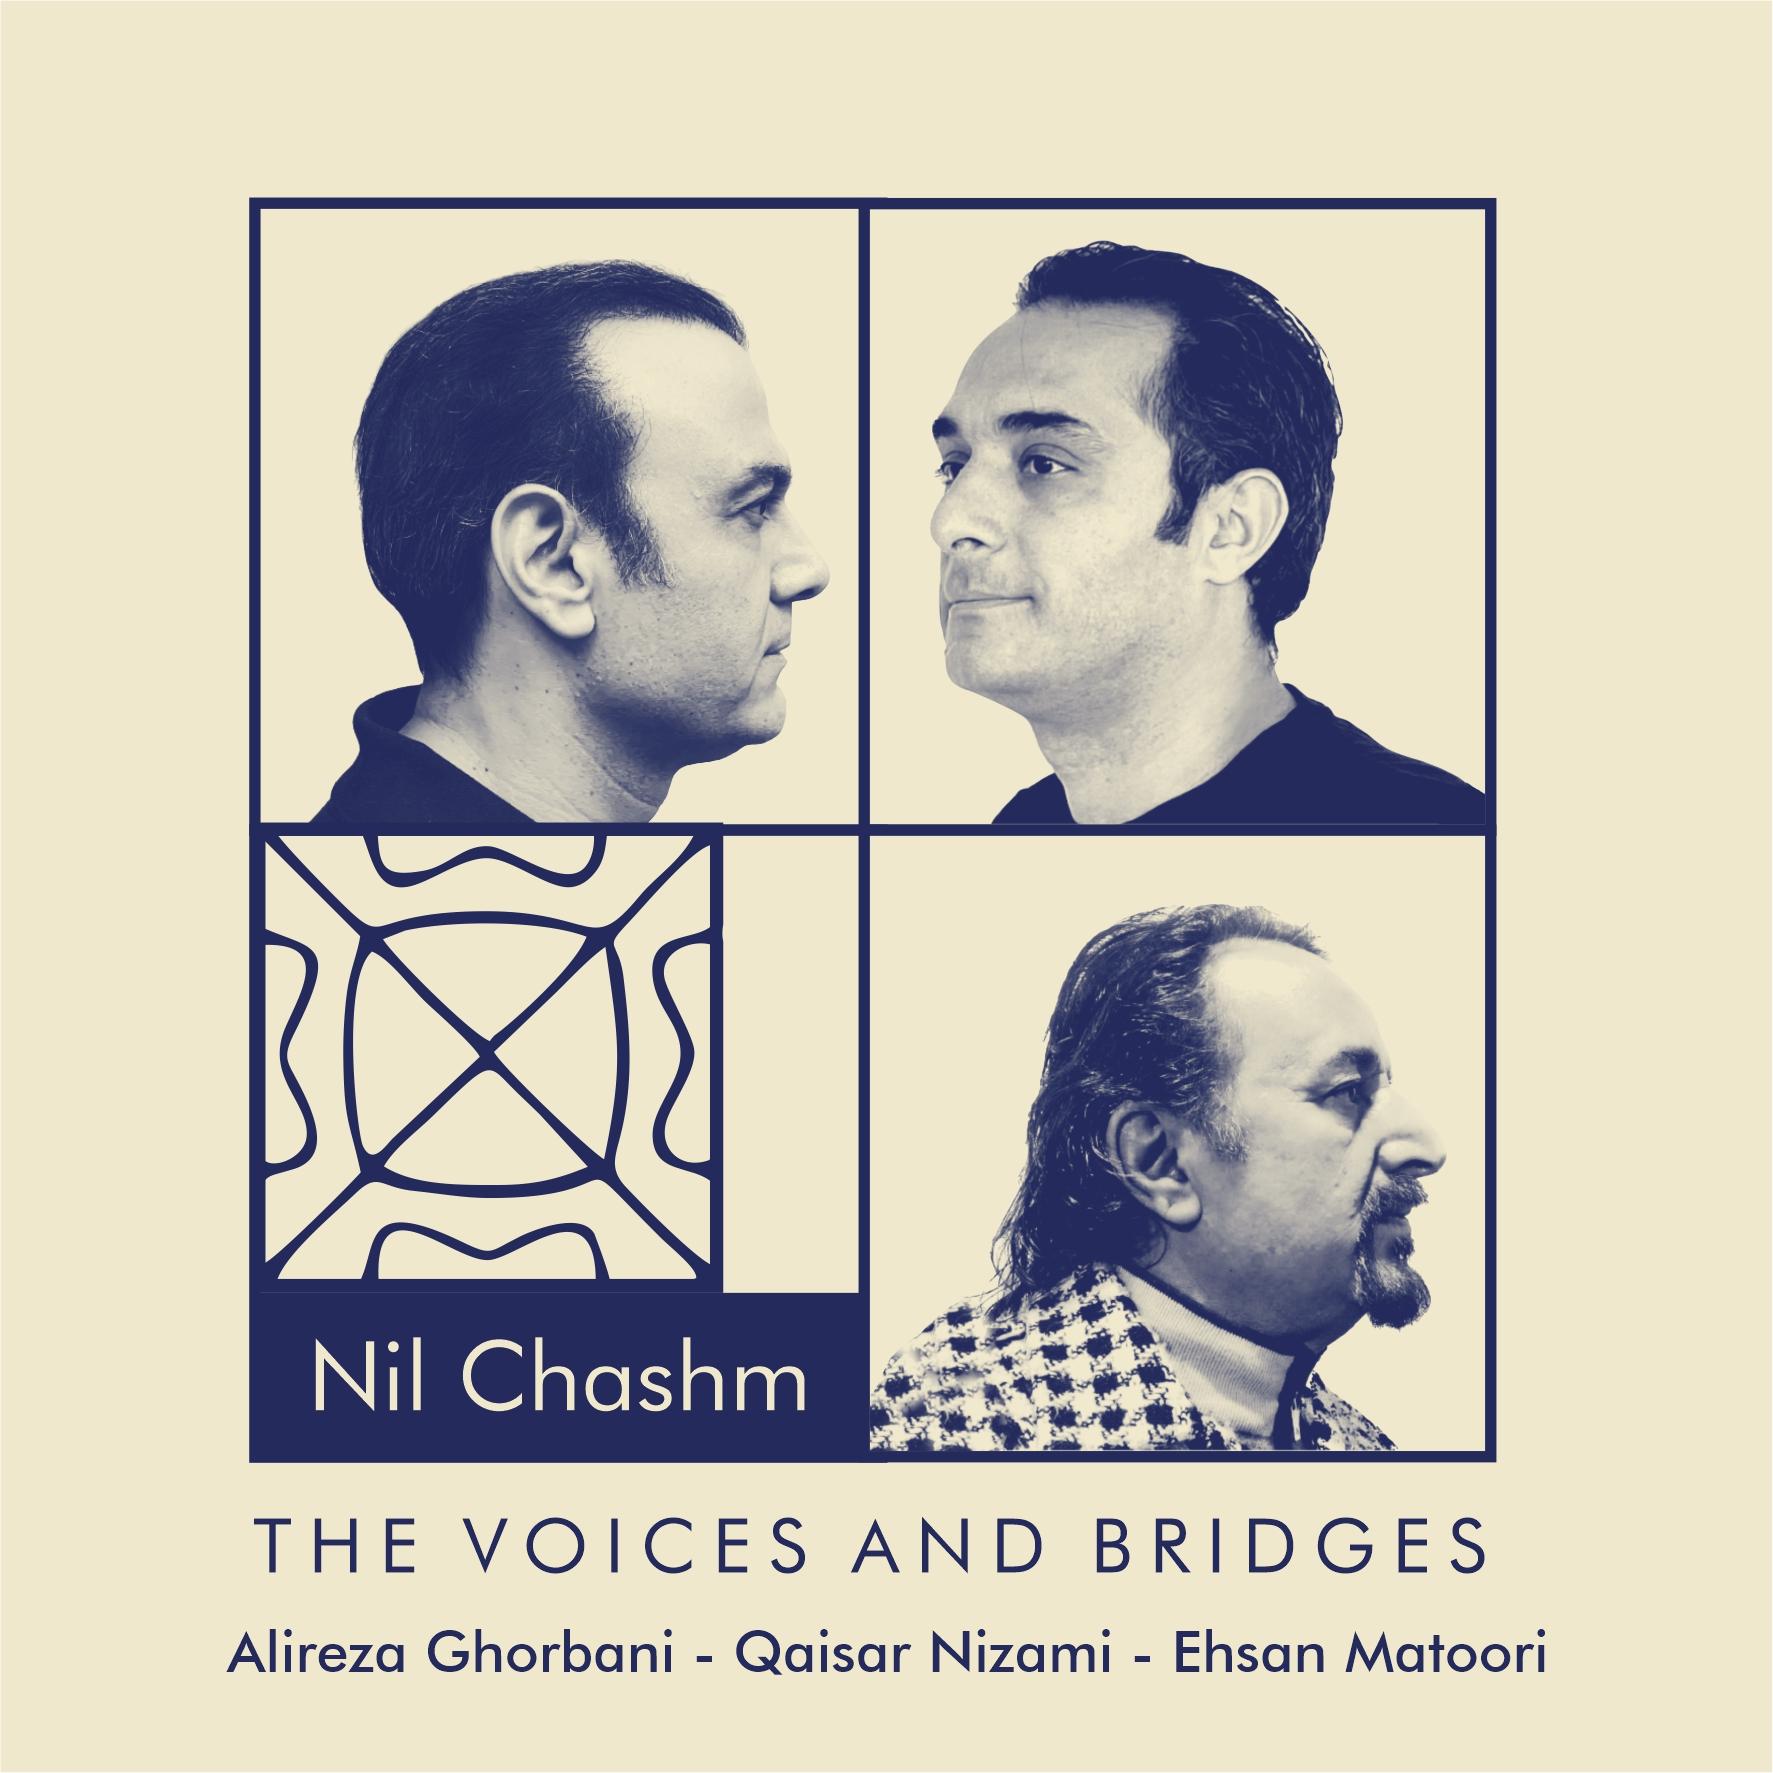 Nil Chashm